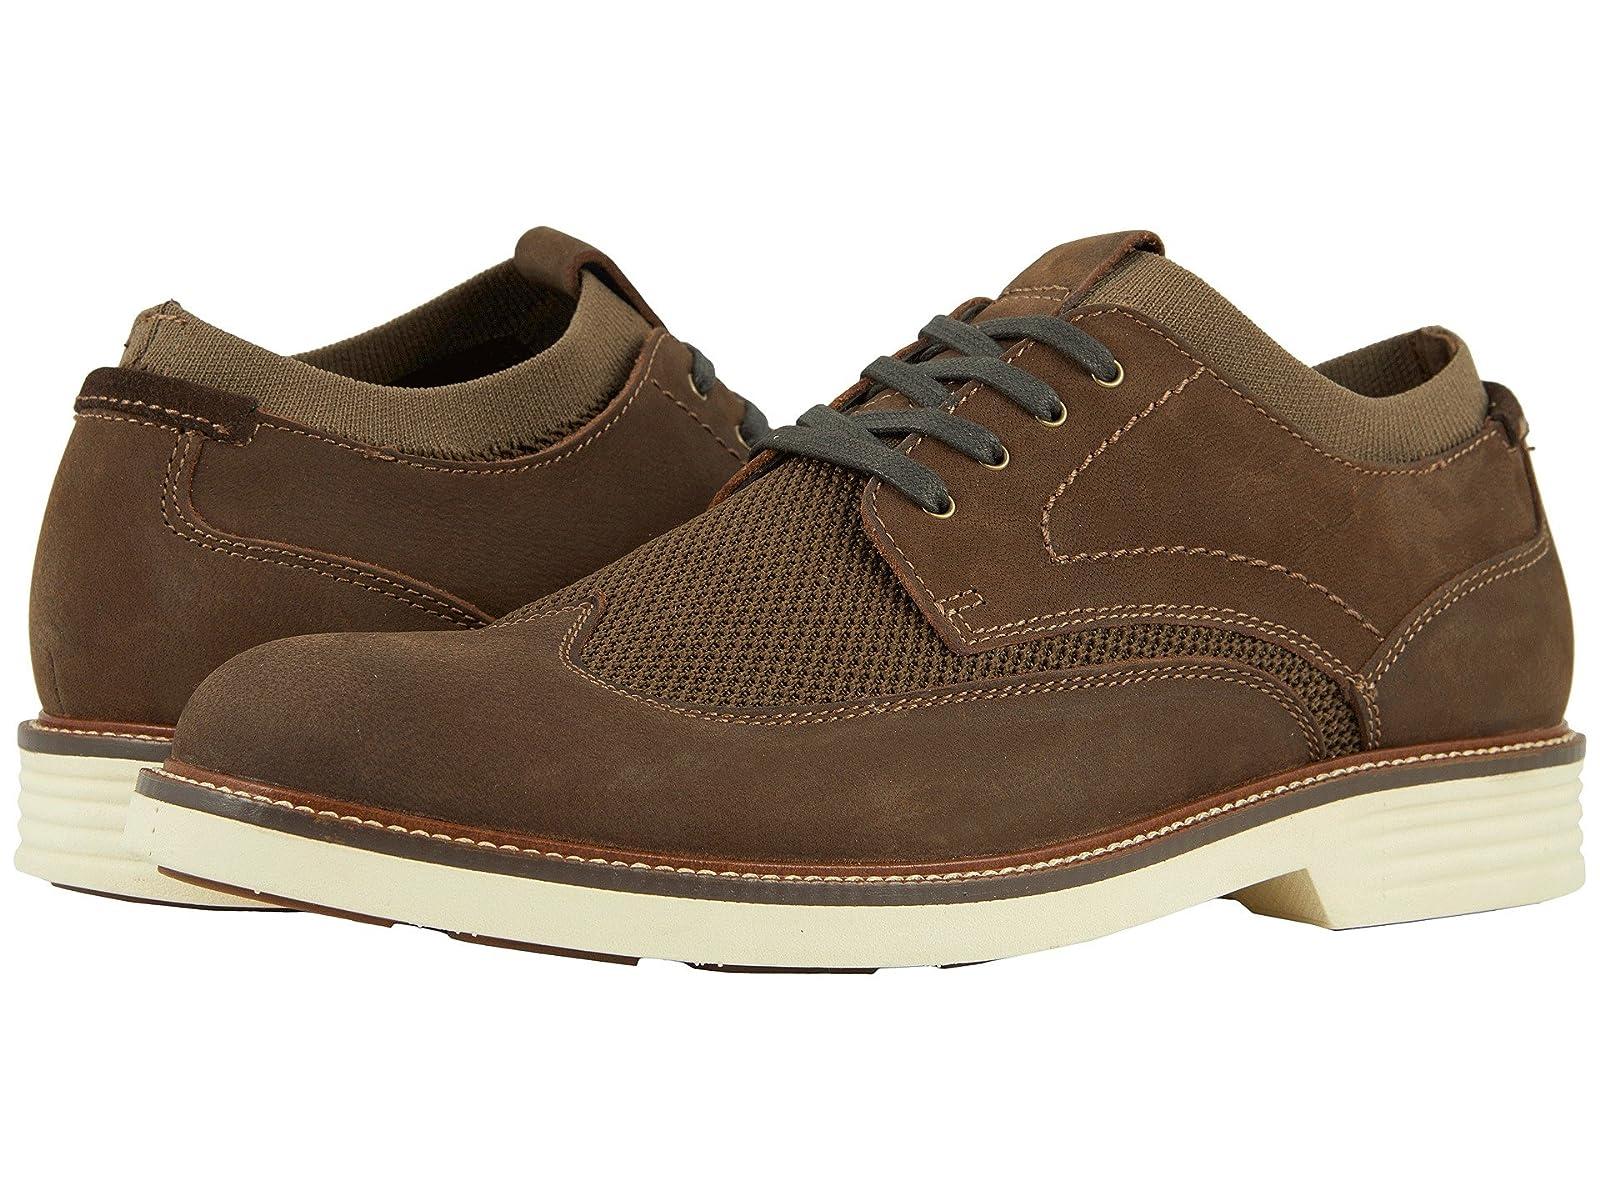 Dockers PaigelandAtmospheric grades have affordable shoes